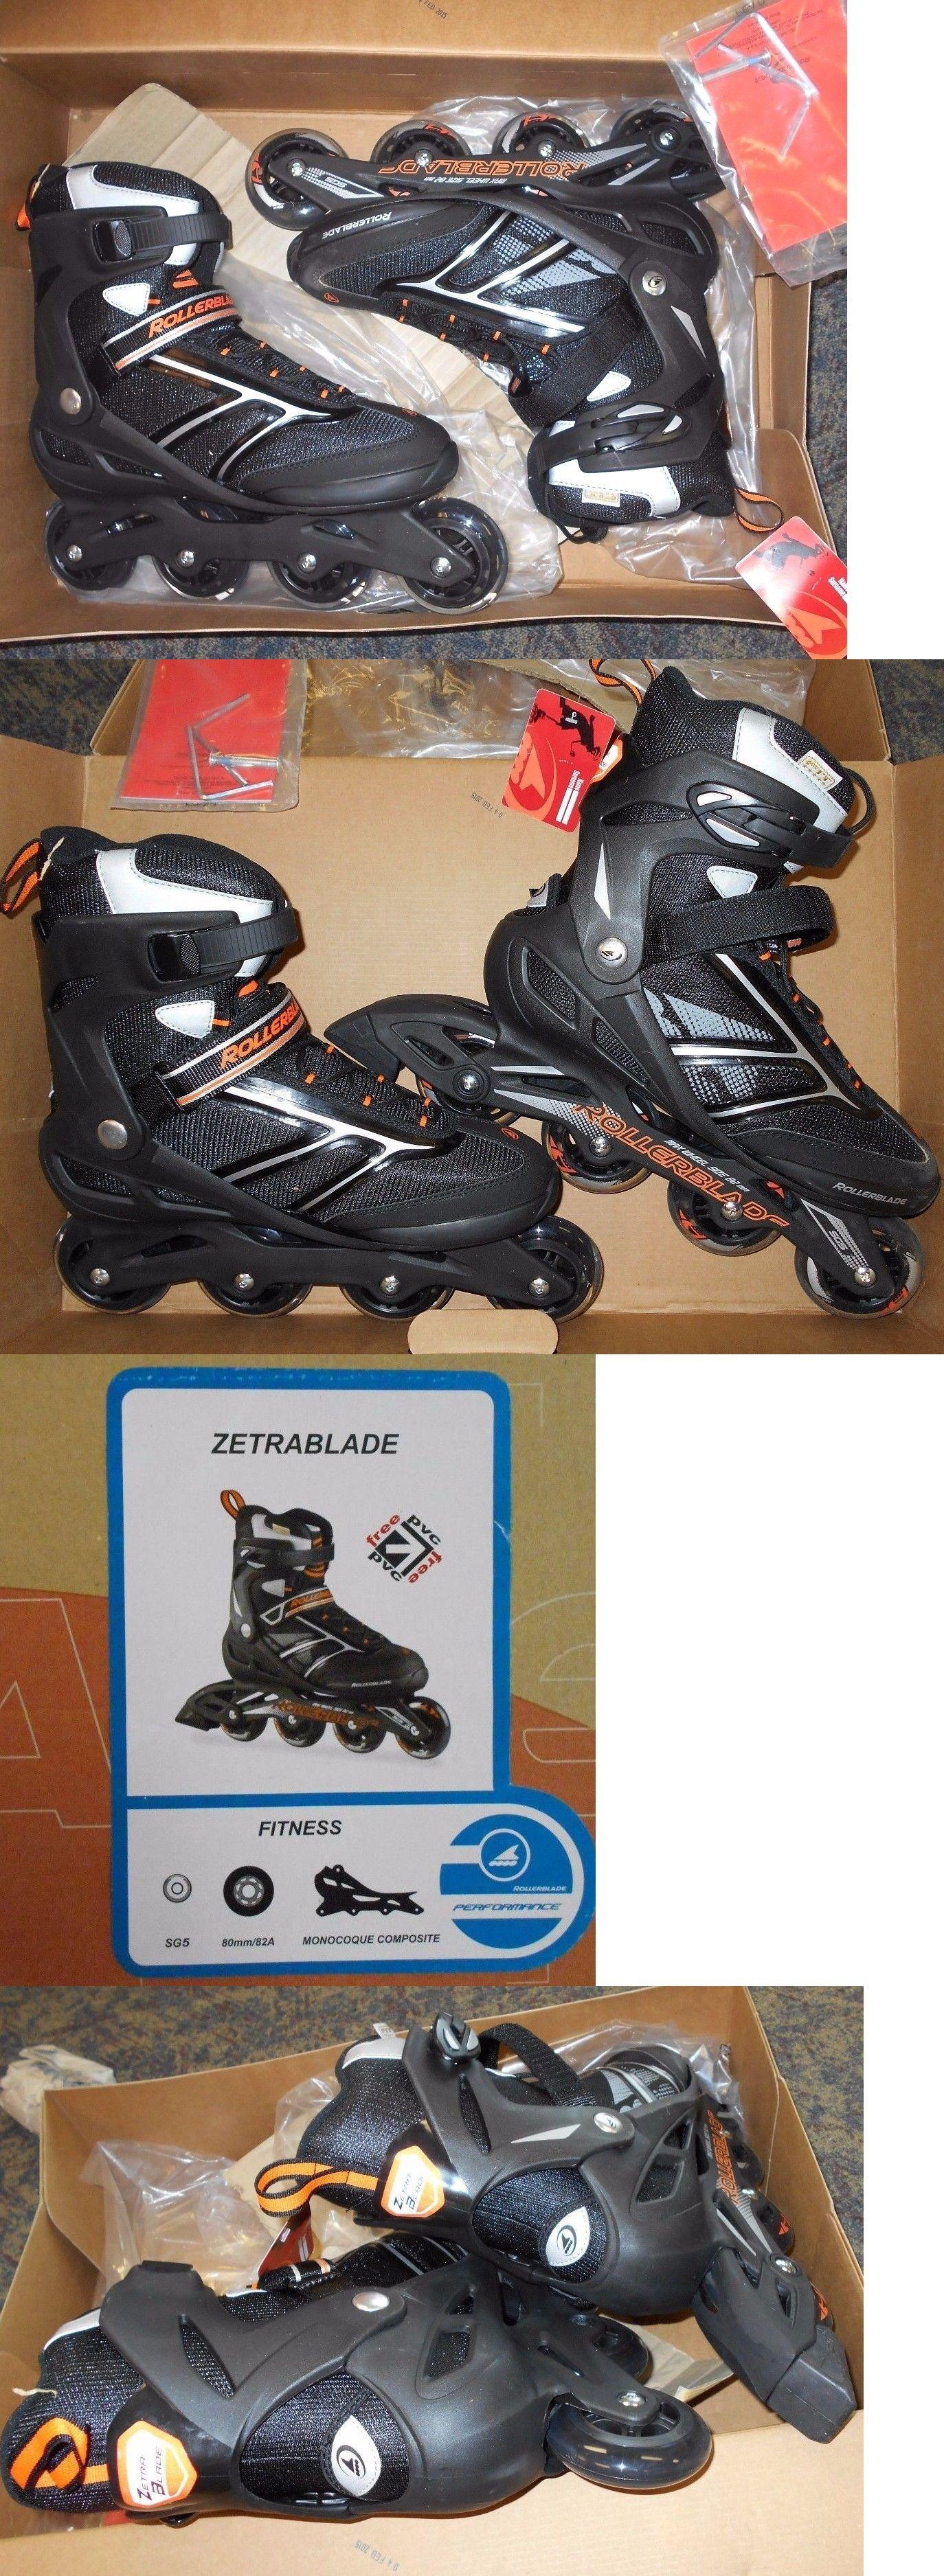 Men 47346 New Rollerblade Zetrablade Inline Roller Skate Black 11 Aggressive Skates Orange Eu 445